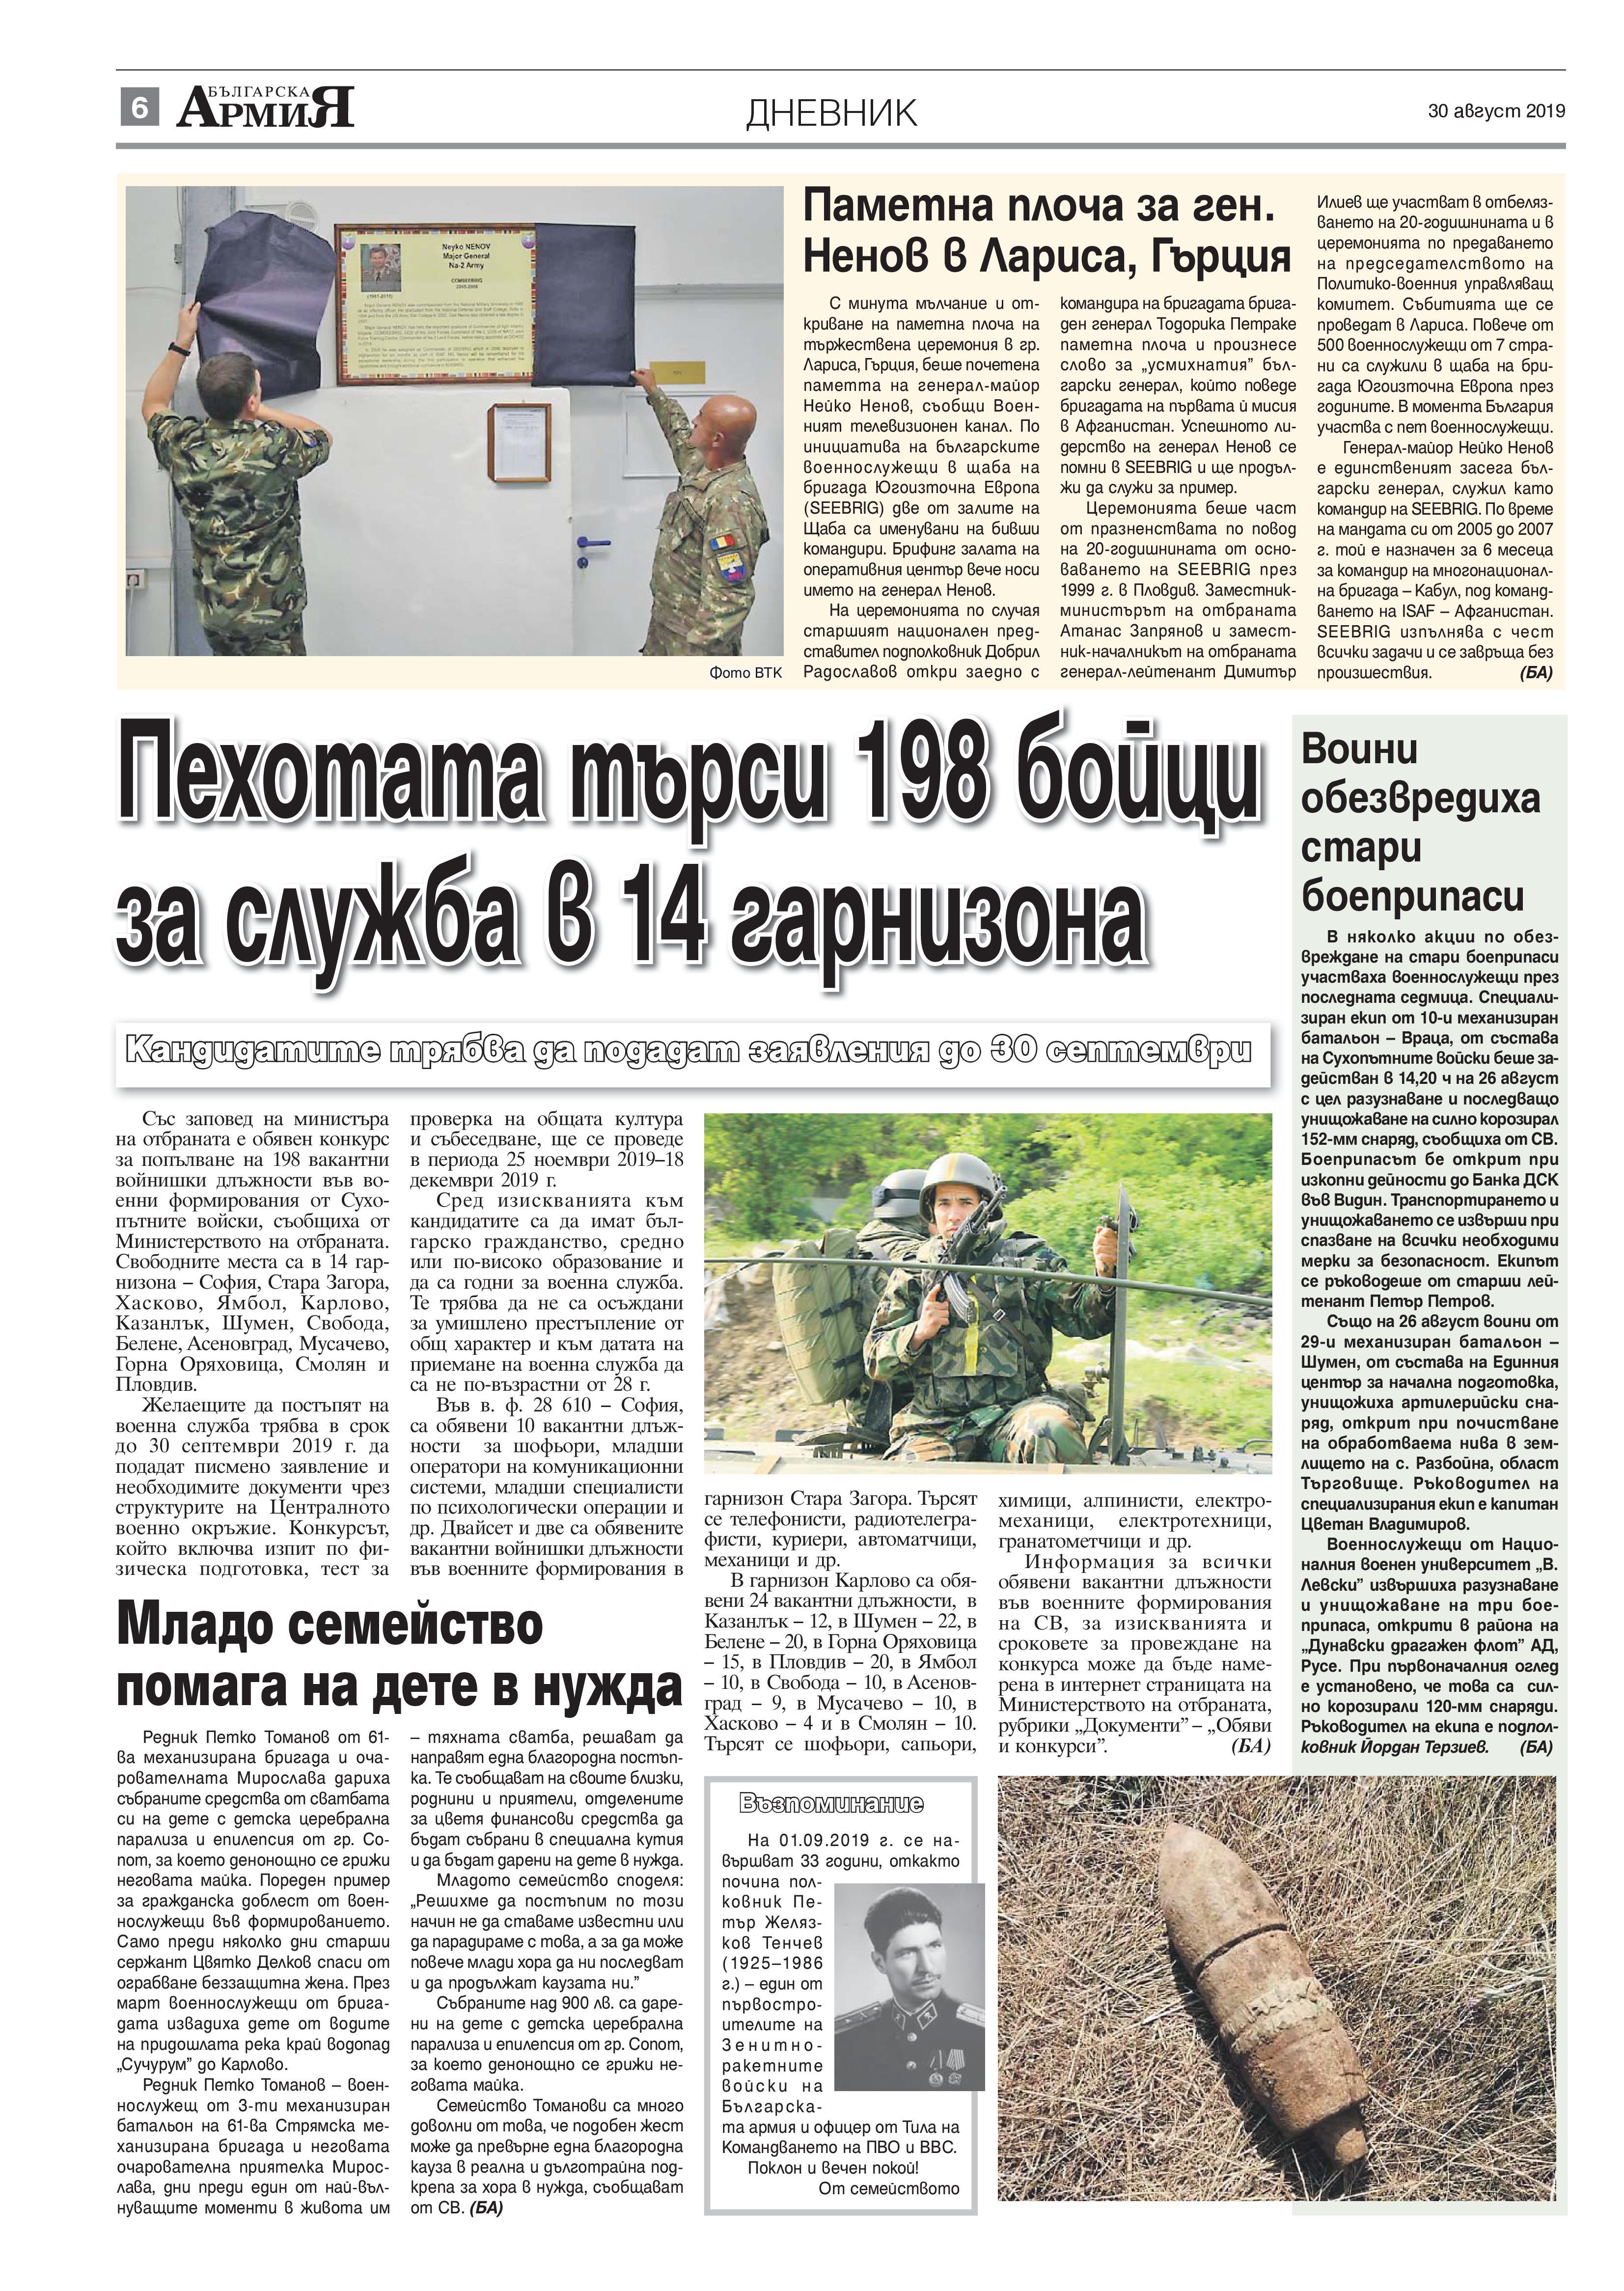 https://www.armymedia.bg/wp-content/uploads/2015/06/06-30.jpg